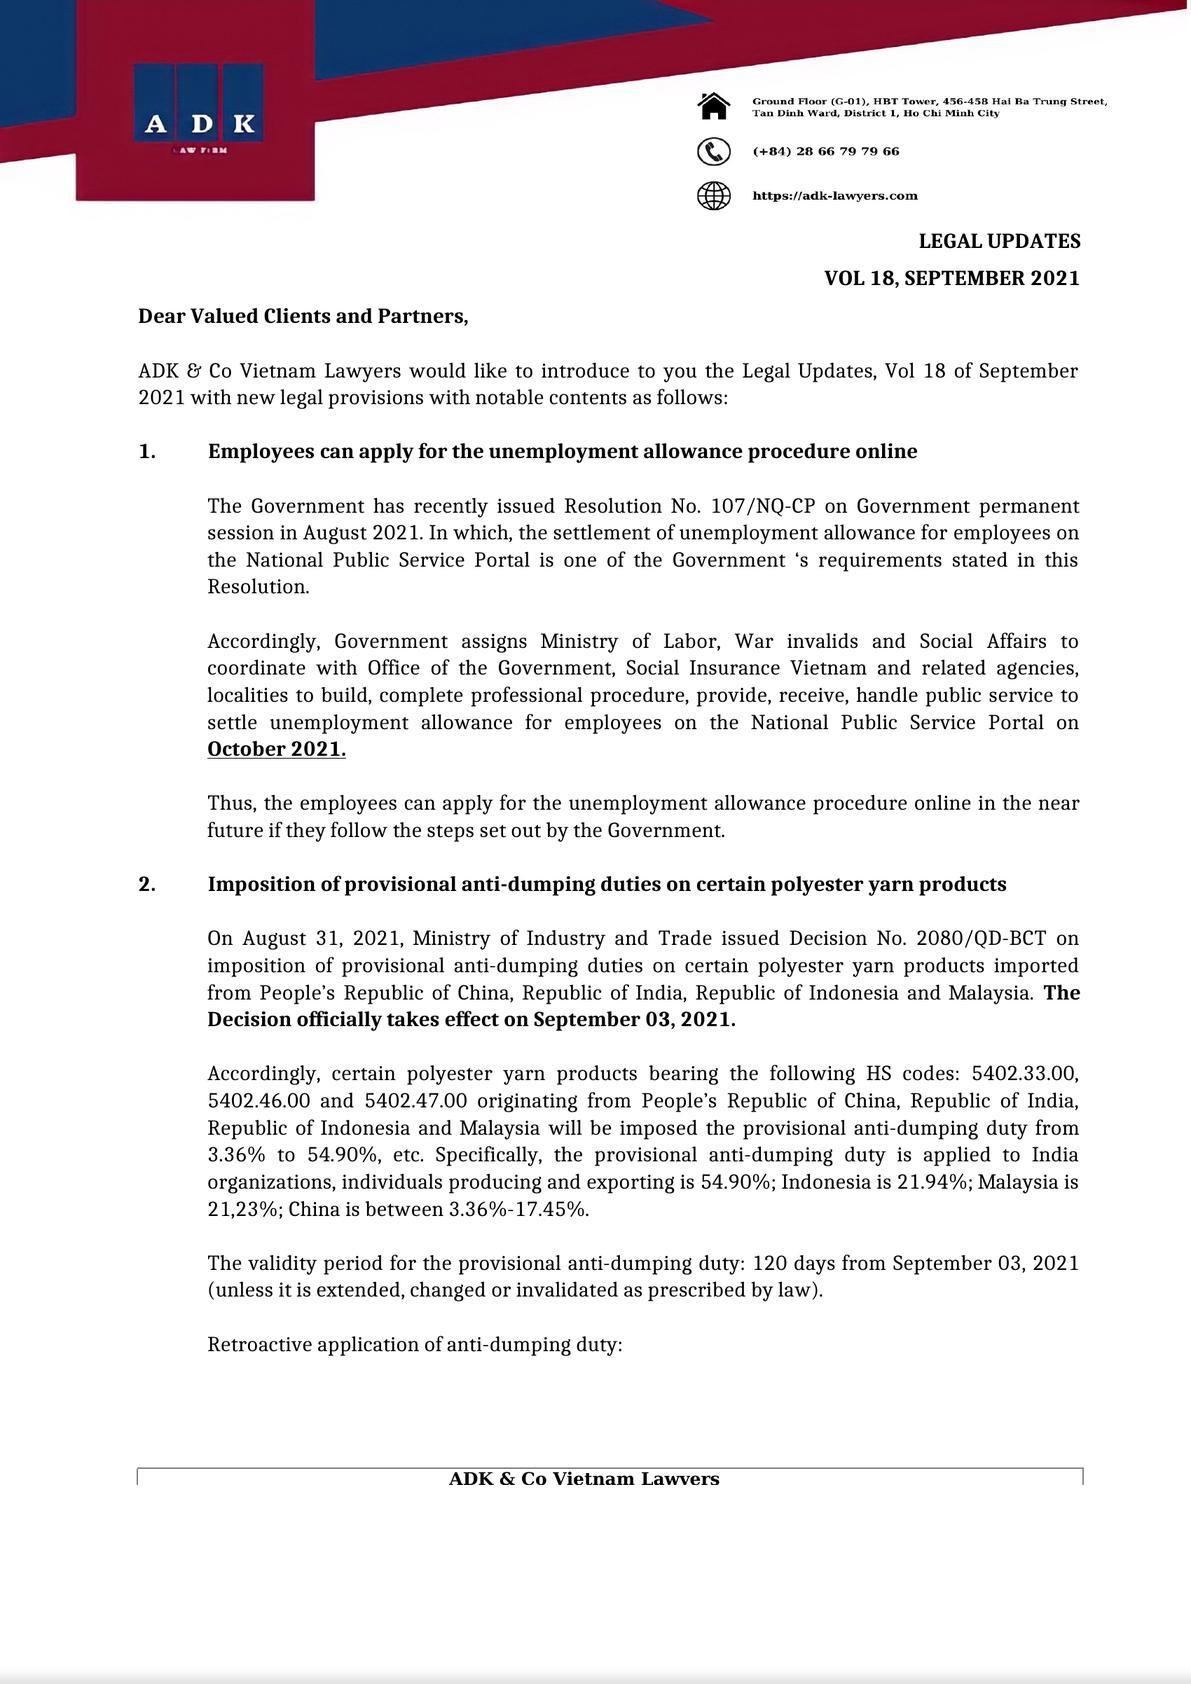 Legal Update Vol 18 September 2021-0